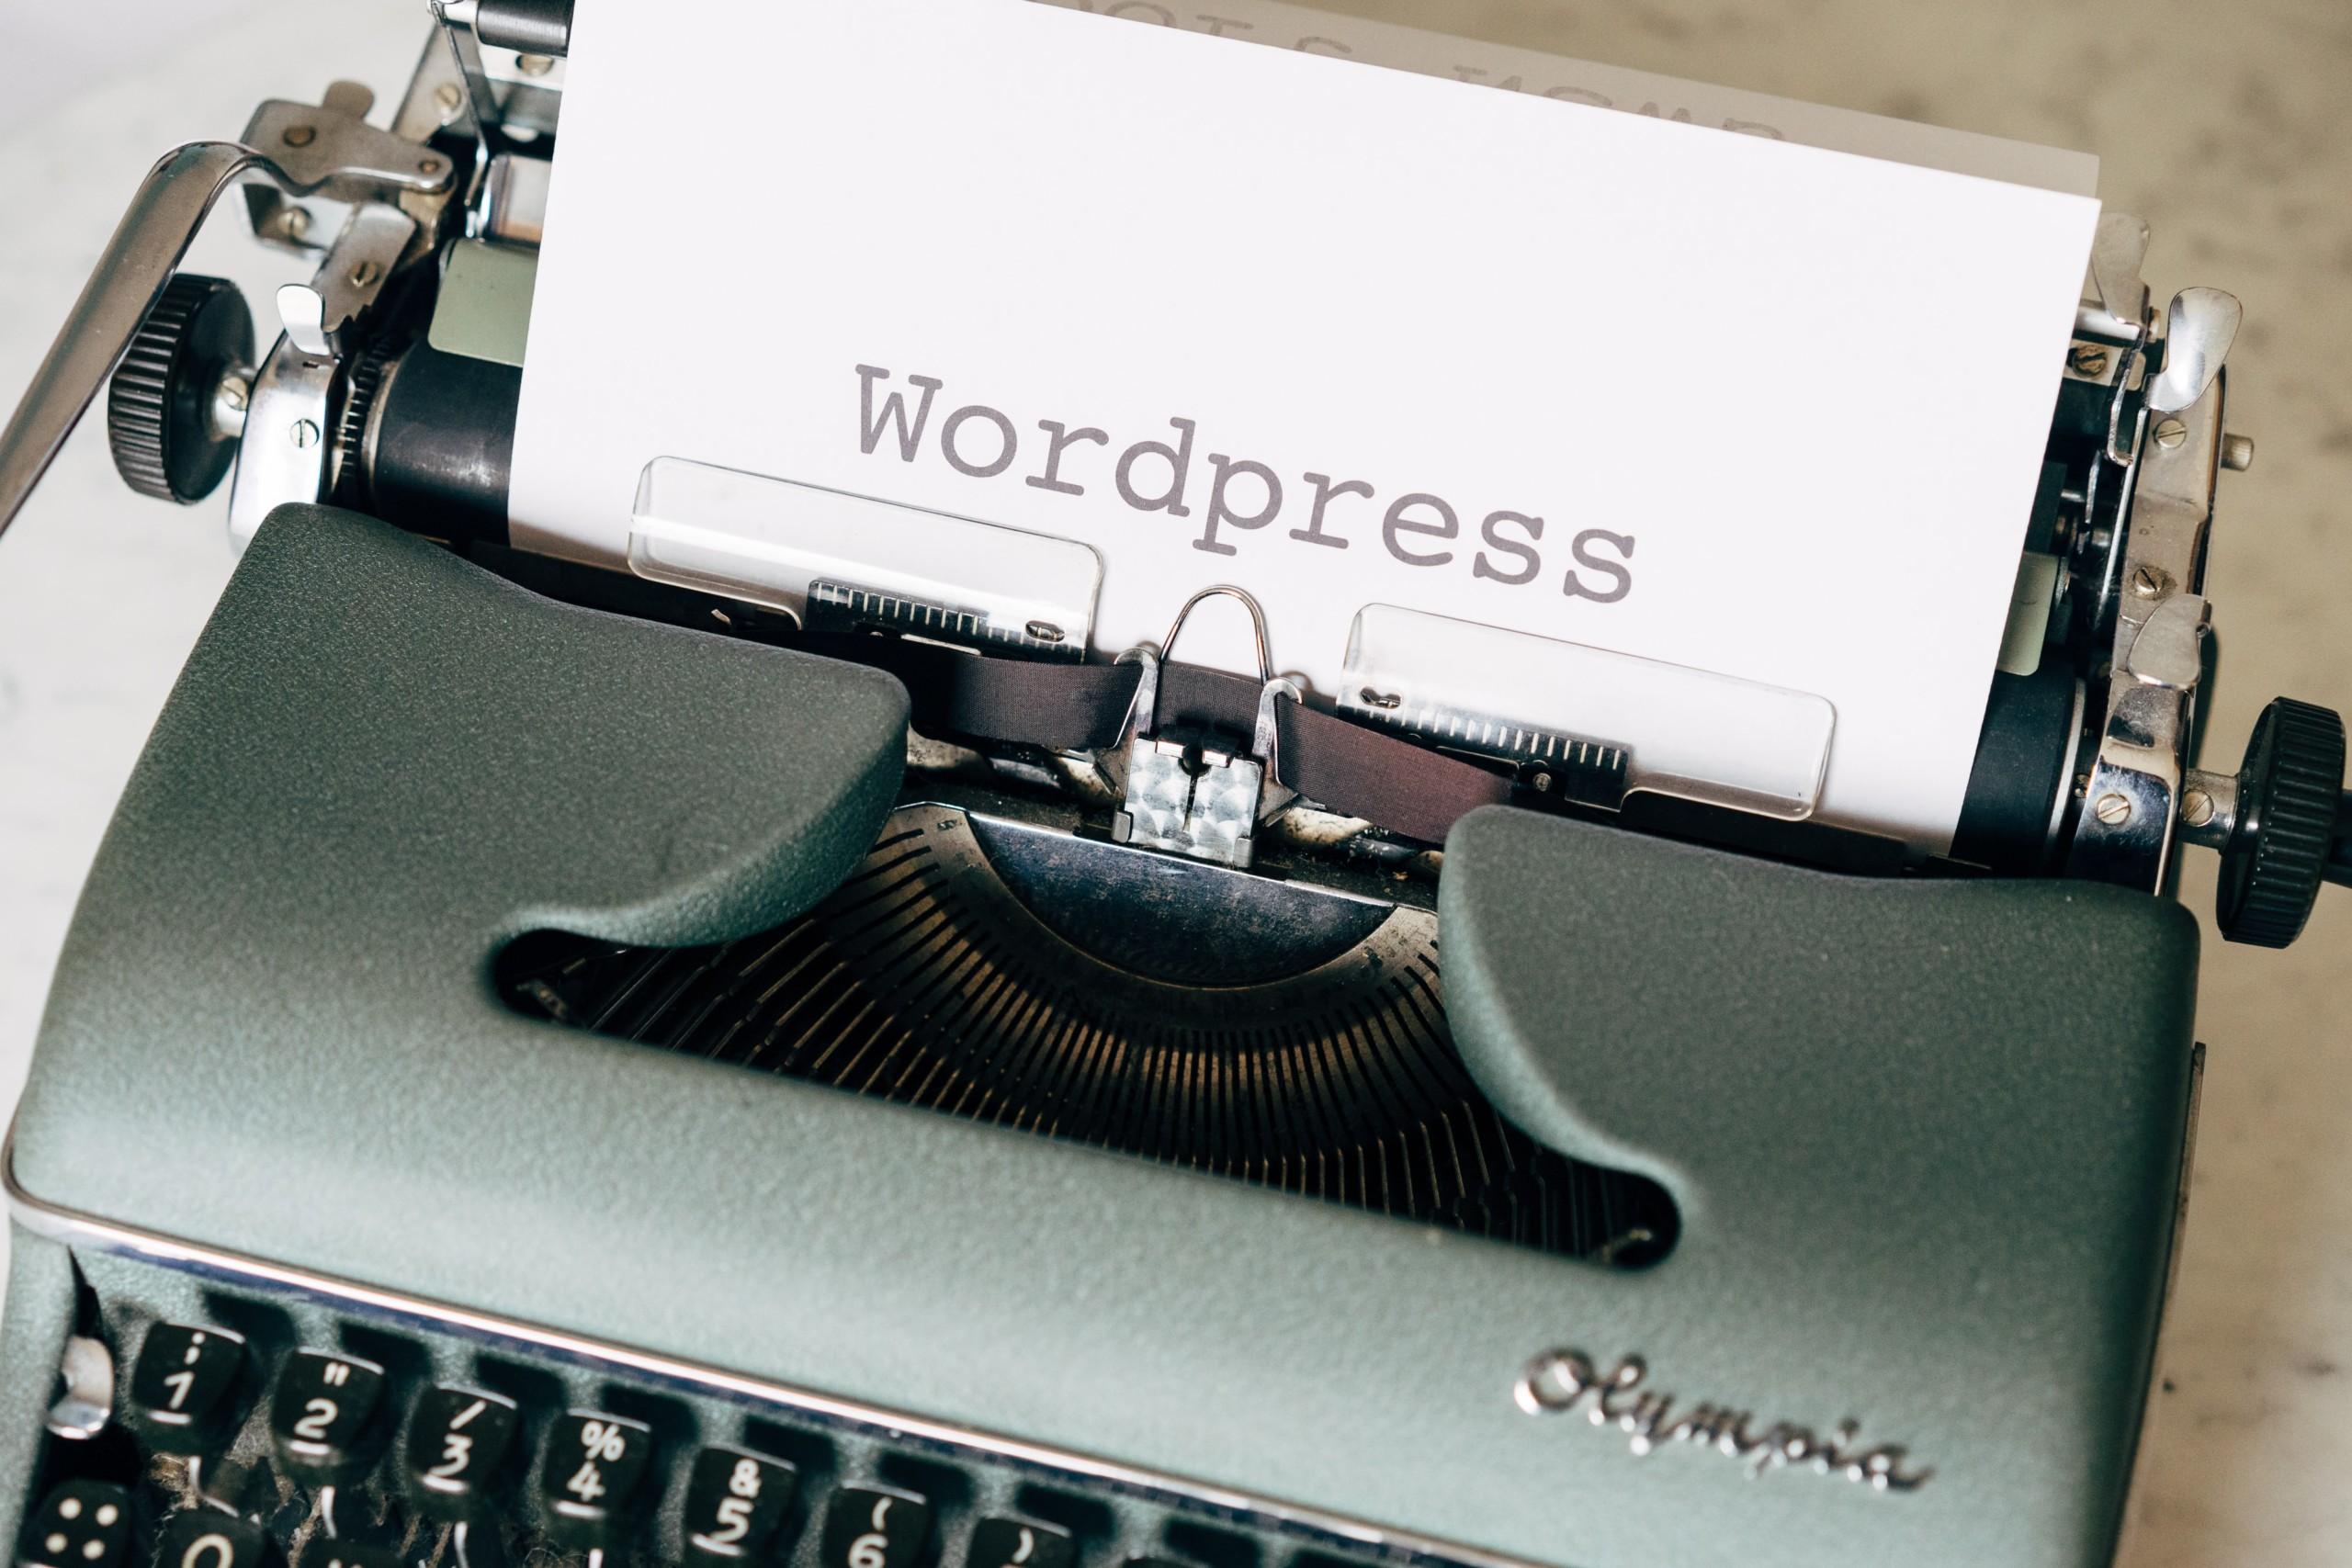 WordPressで多言語のサイトをマルチサイトで作る